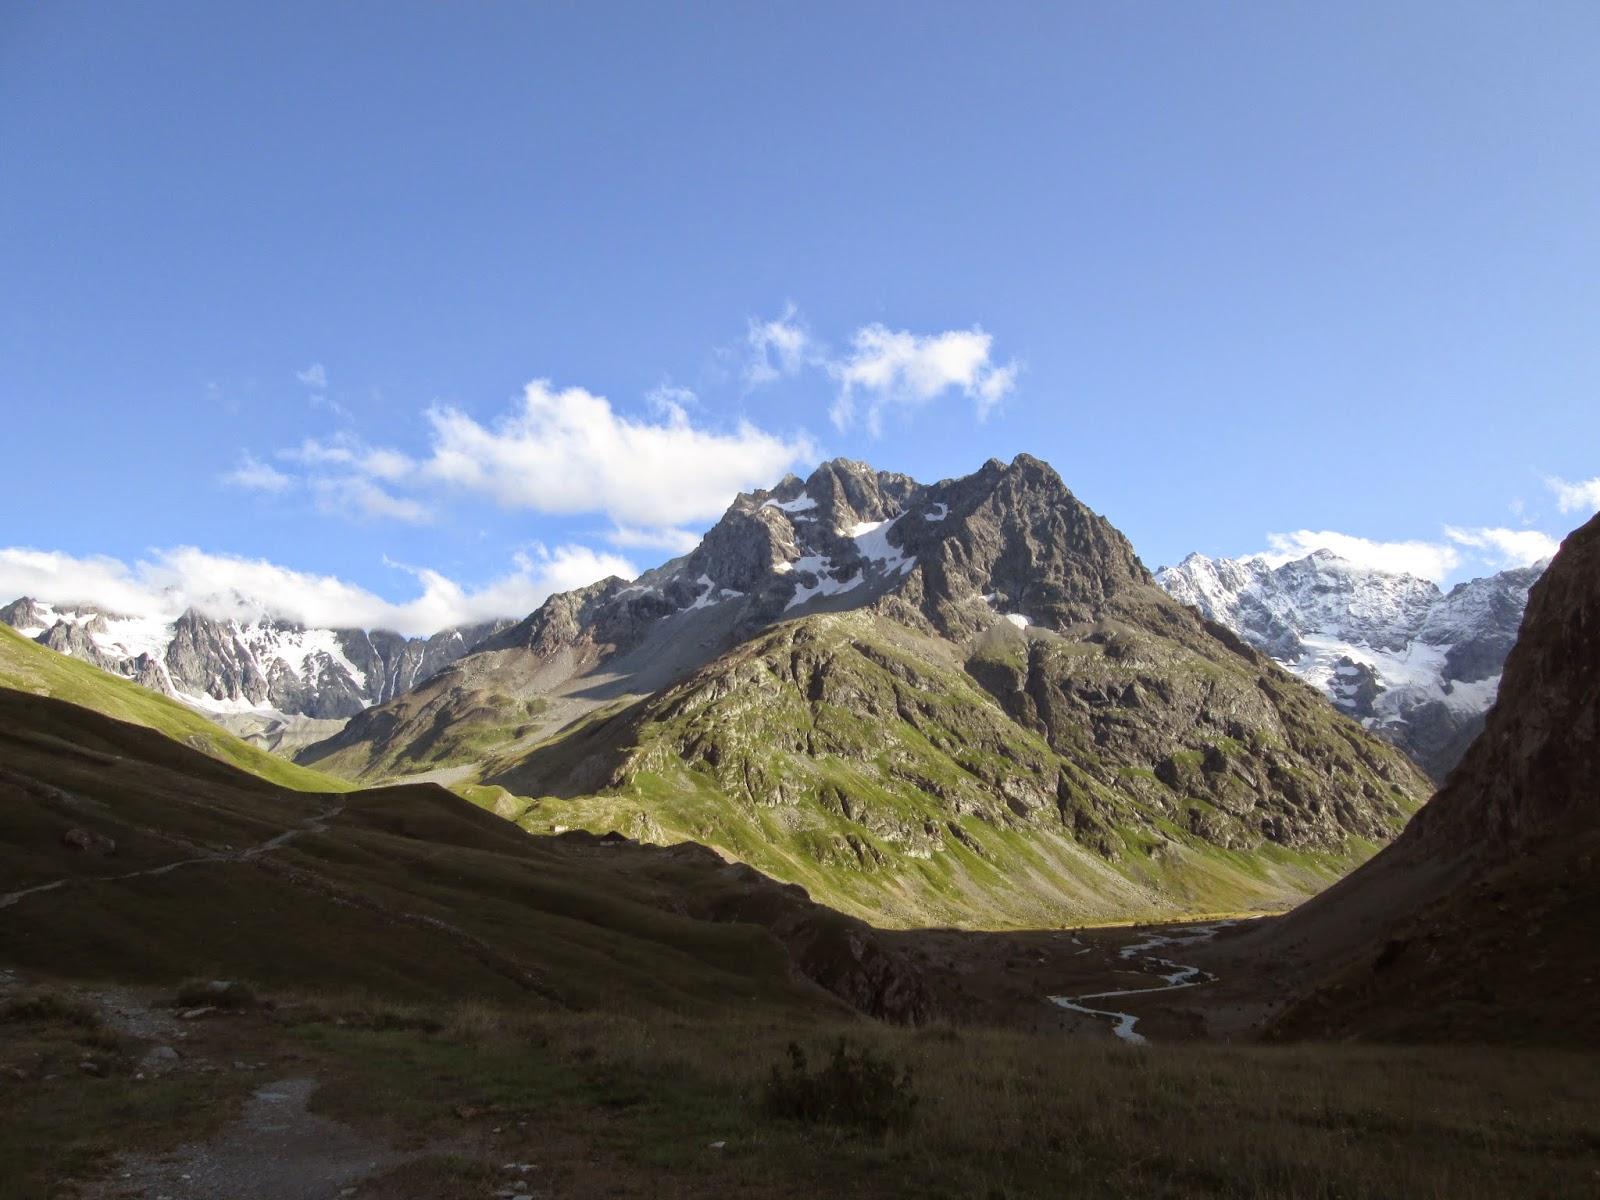 Ecrins National Park, France, Alps